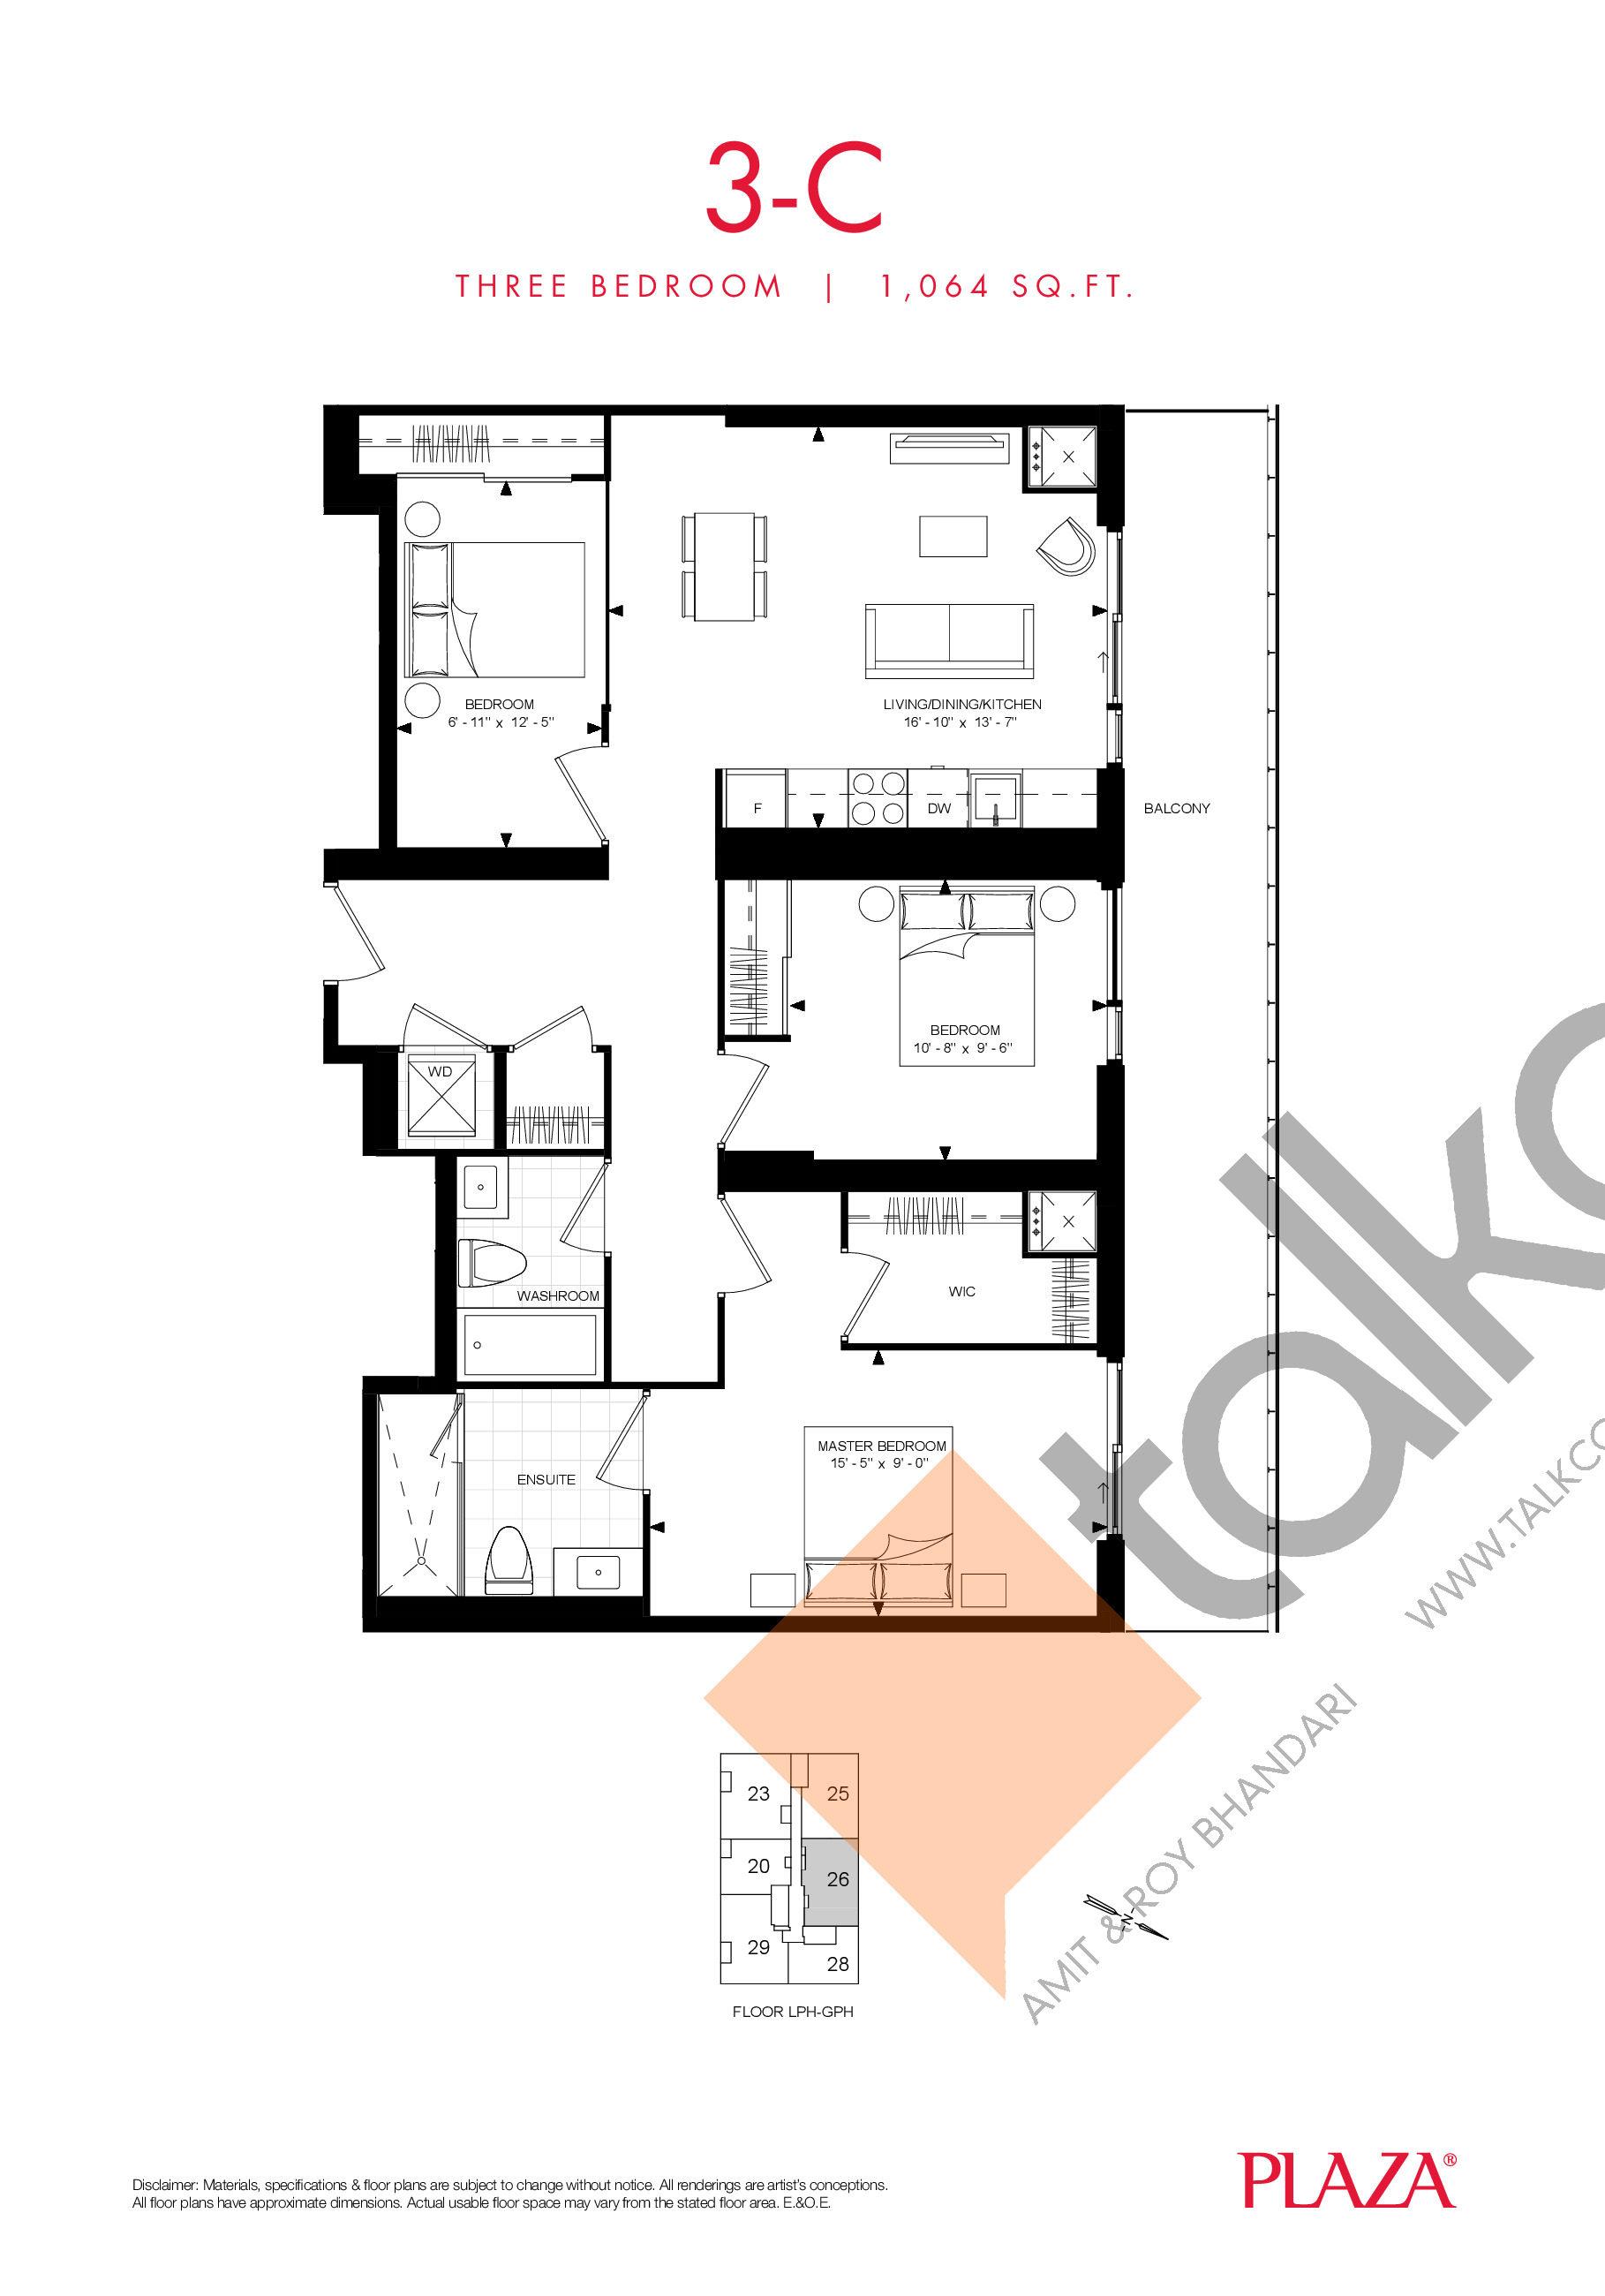 3-C Floor Plan at Encore Theatre District Condos - 1064 sq.ft